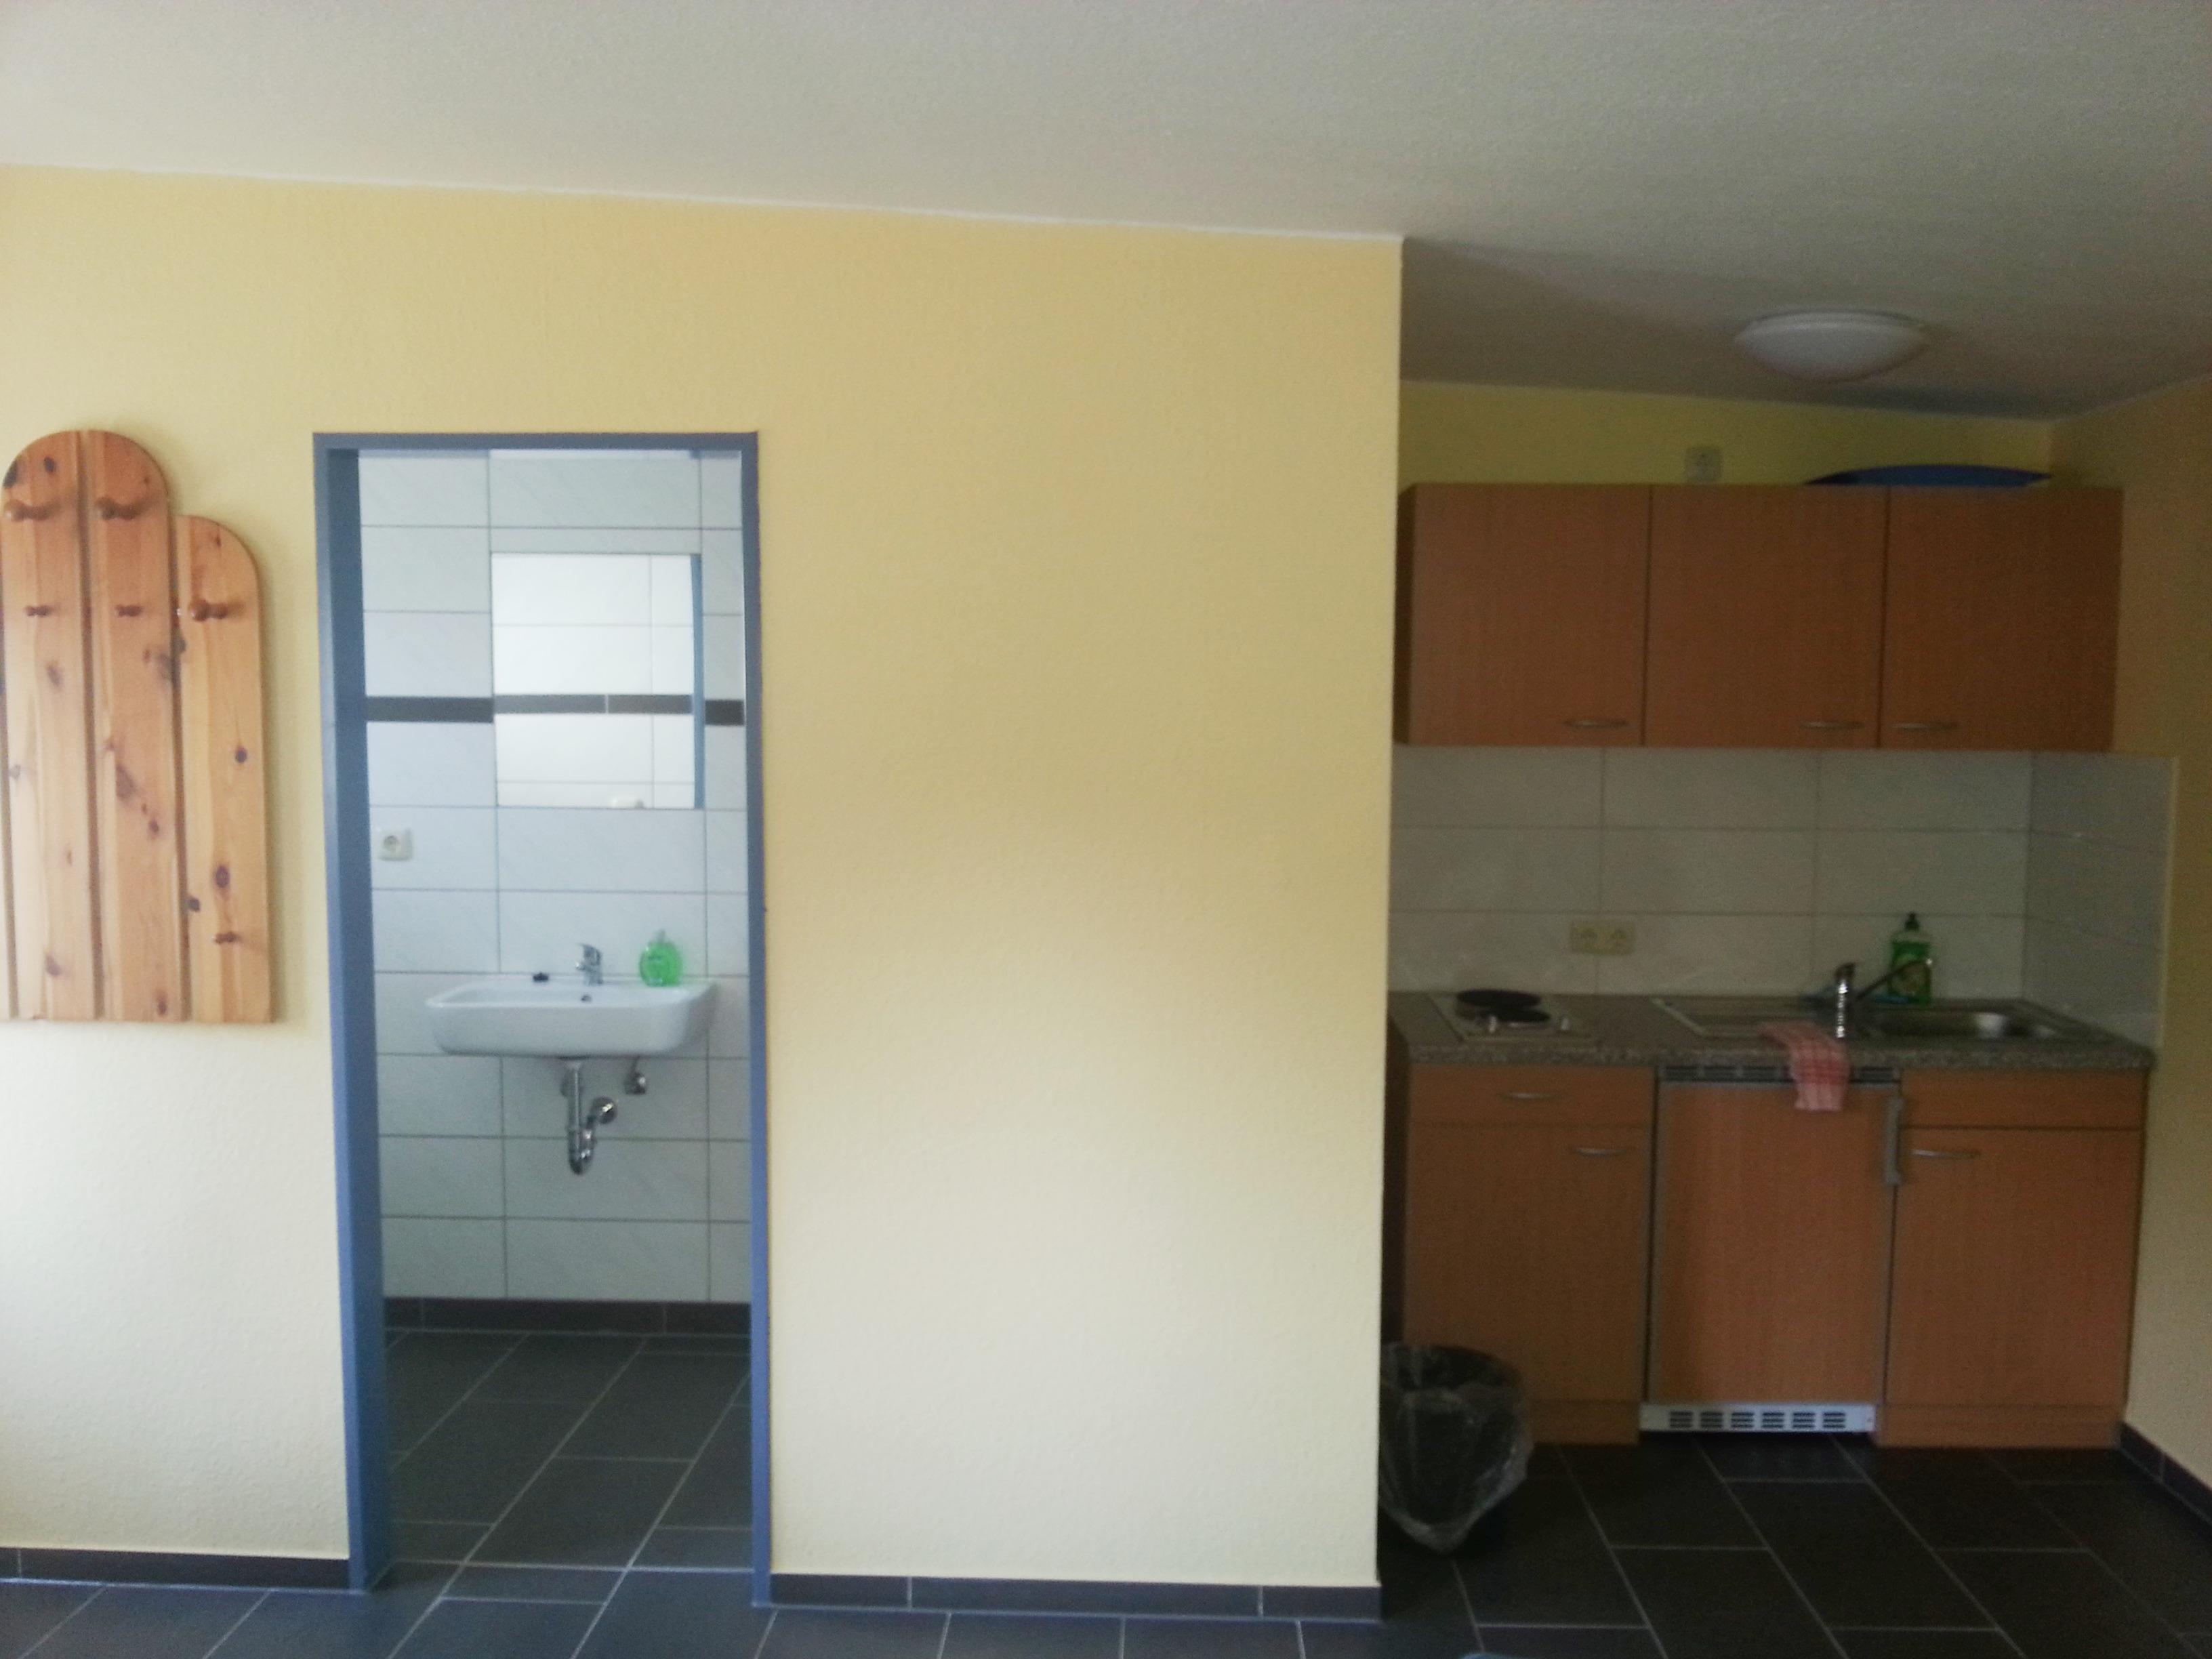 Elternappartement (4)